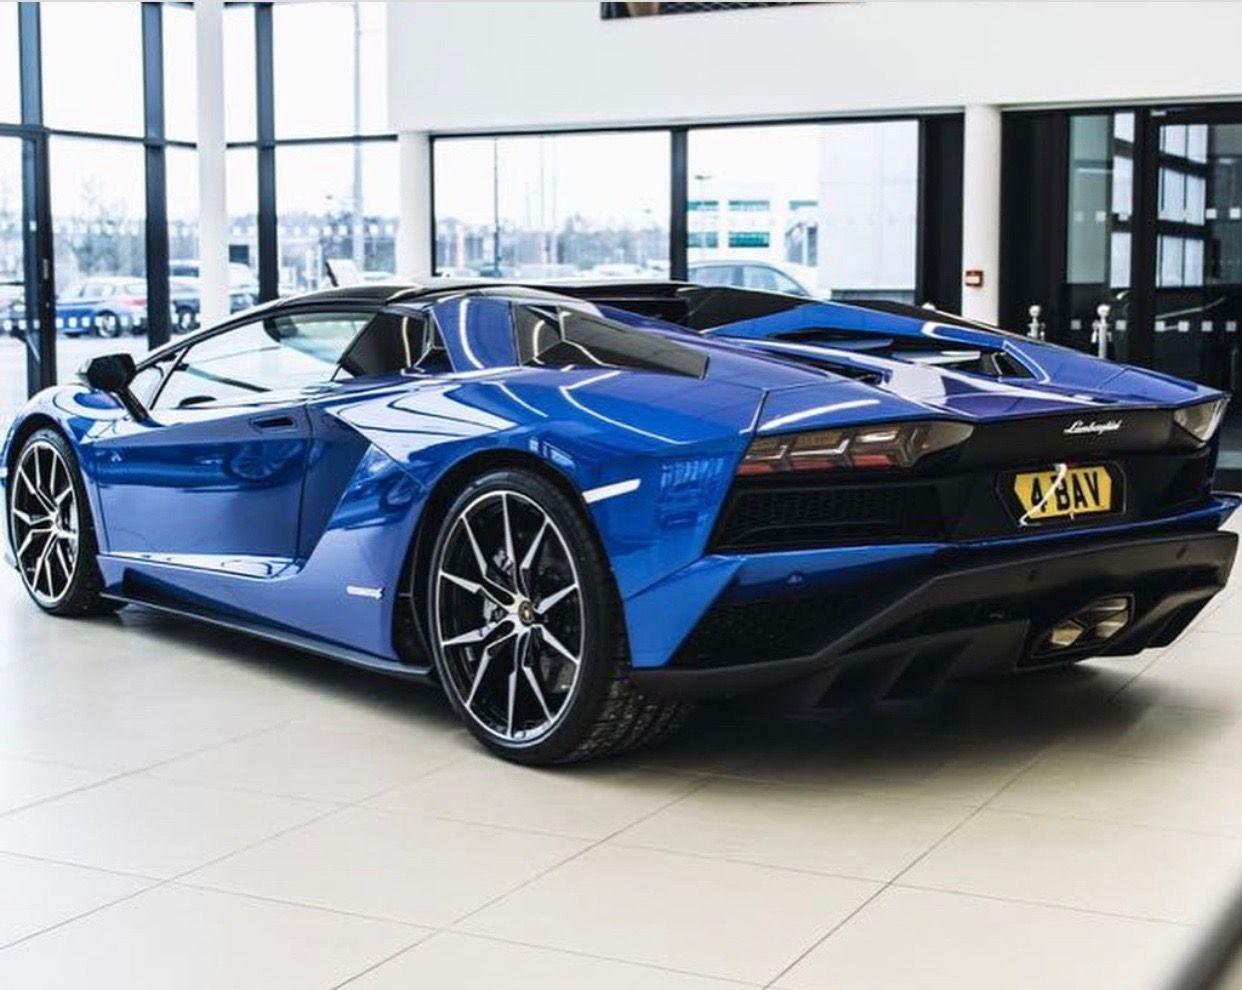 Lamborghini Aventador S Roadster painted in Blu Nethuns